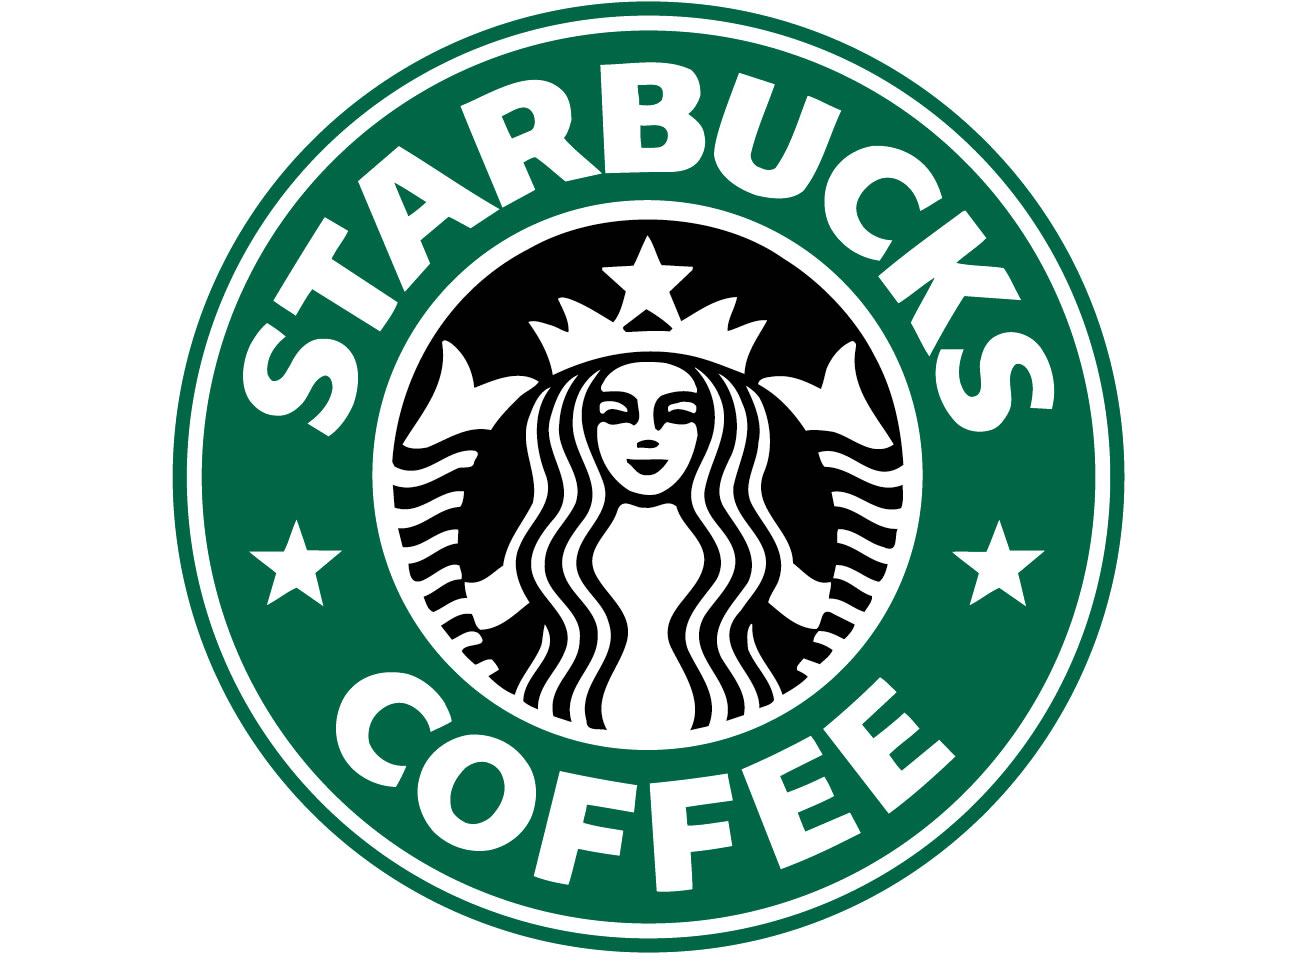 starbucks-coffee-logo.jpg